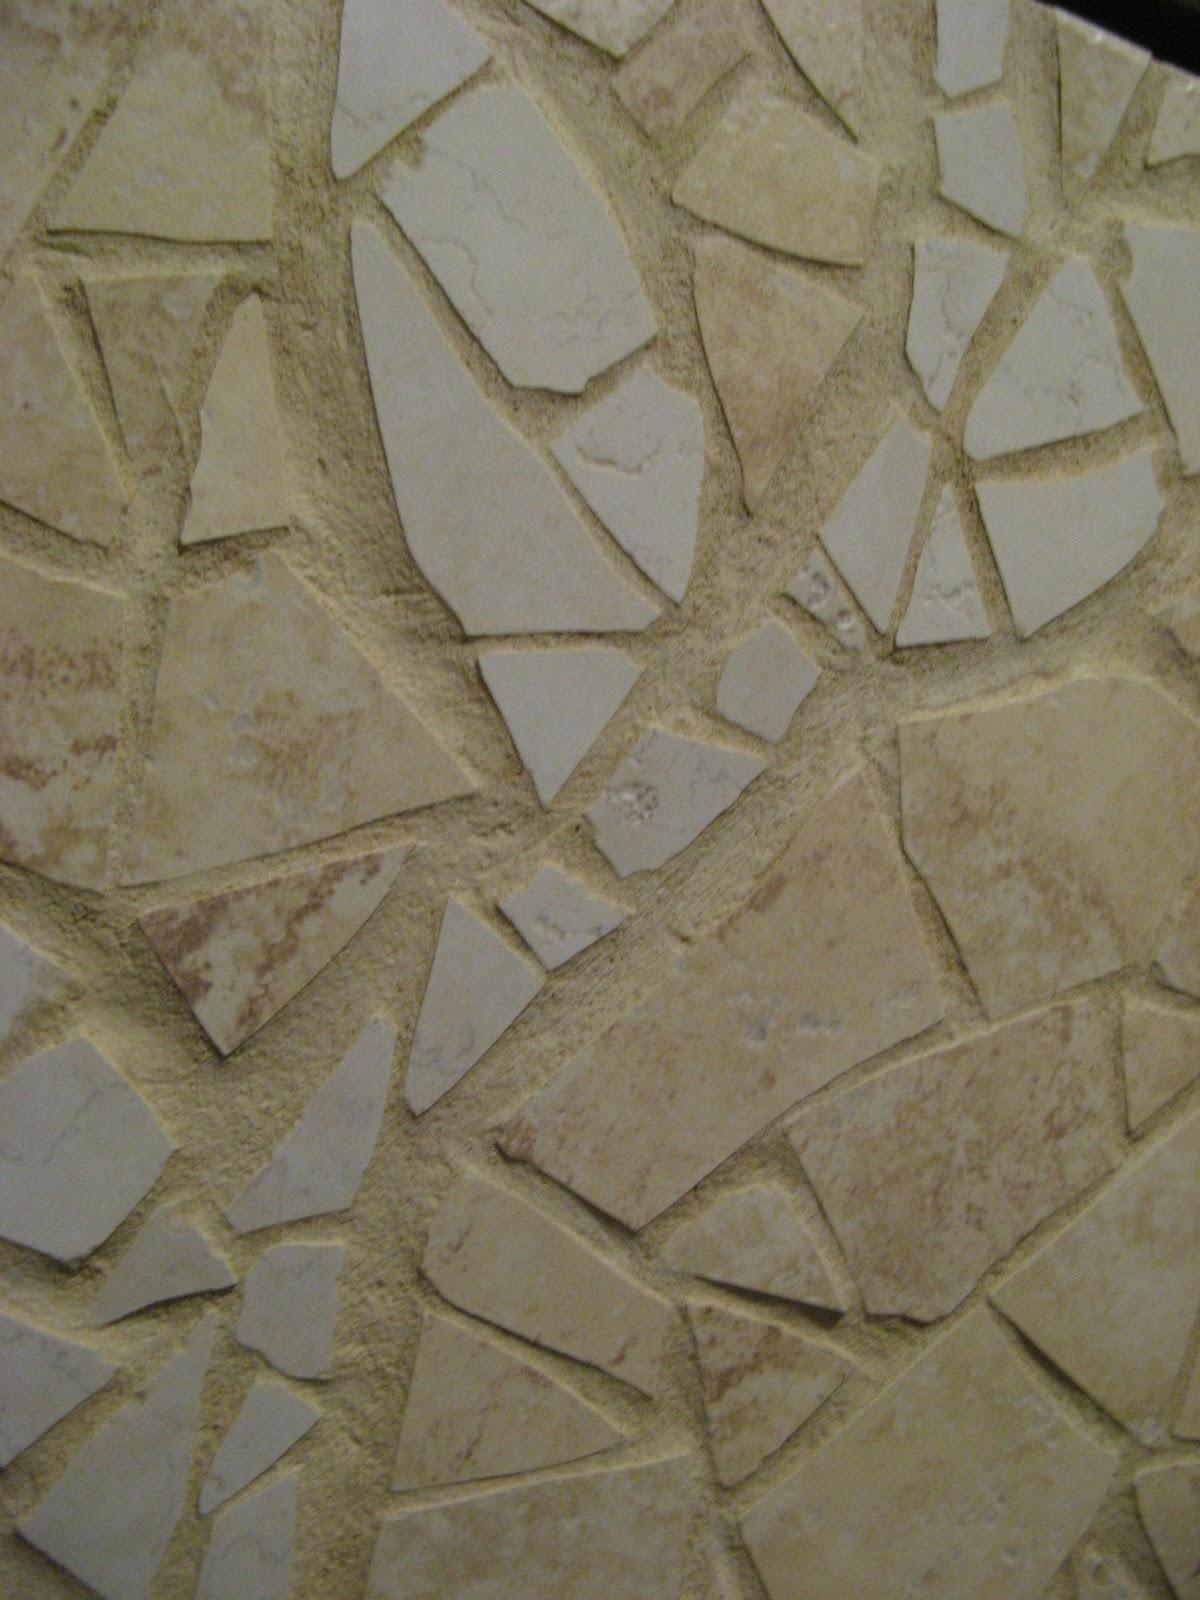 Susan snyder mosaic wall art panels mosaic broken tile wall art close up of broken tile mosaic wall art dailygadgetfo Gallery